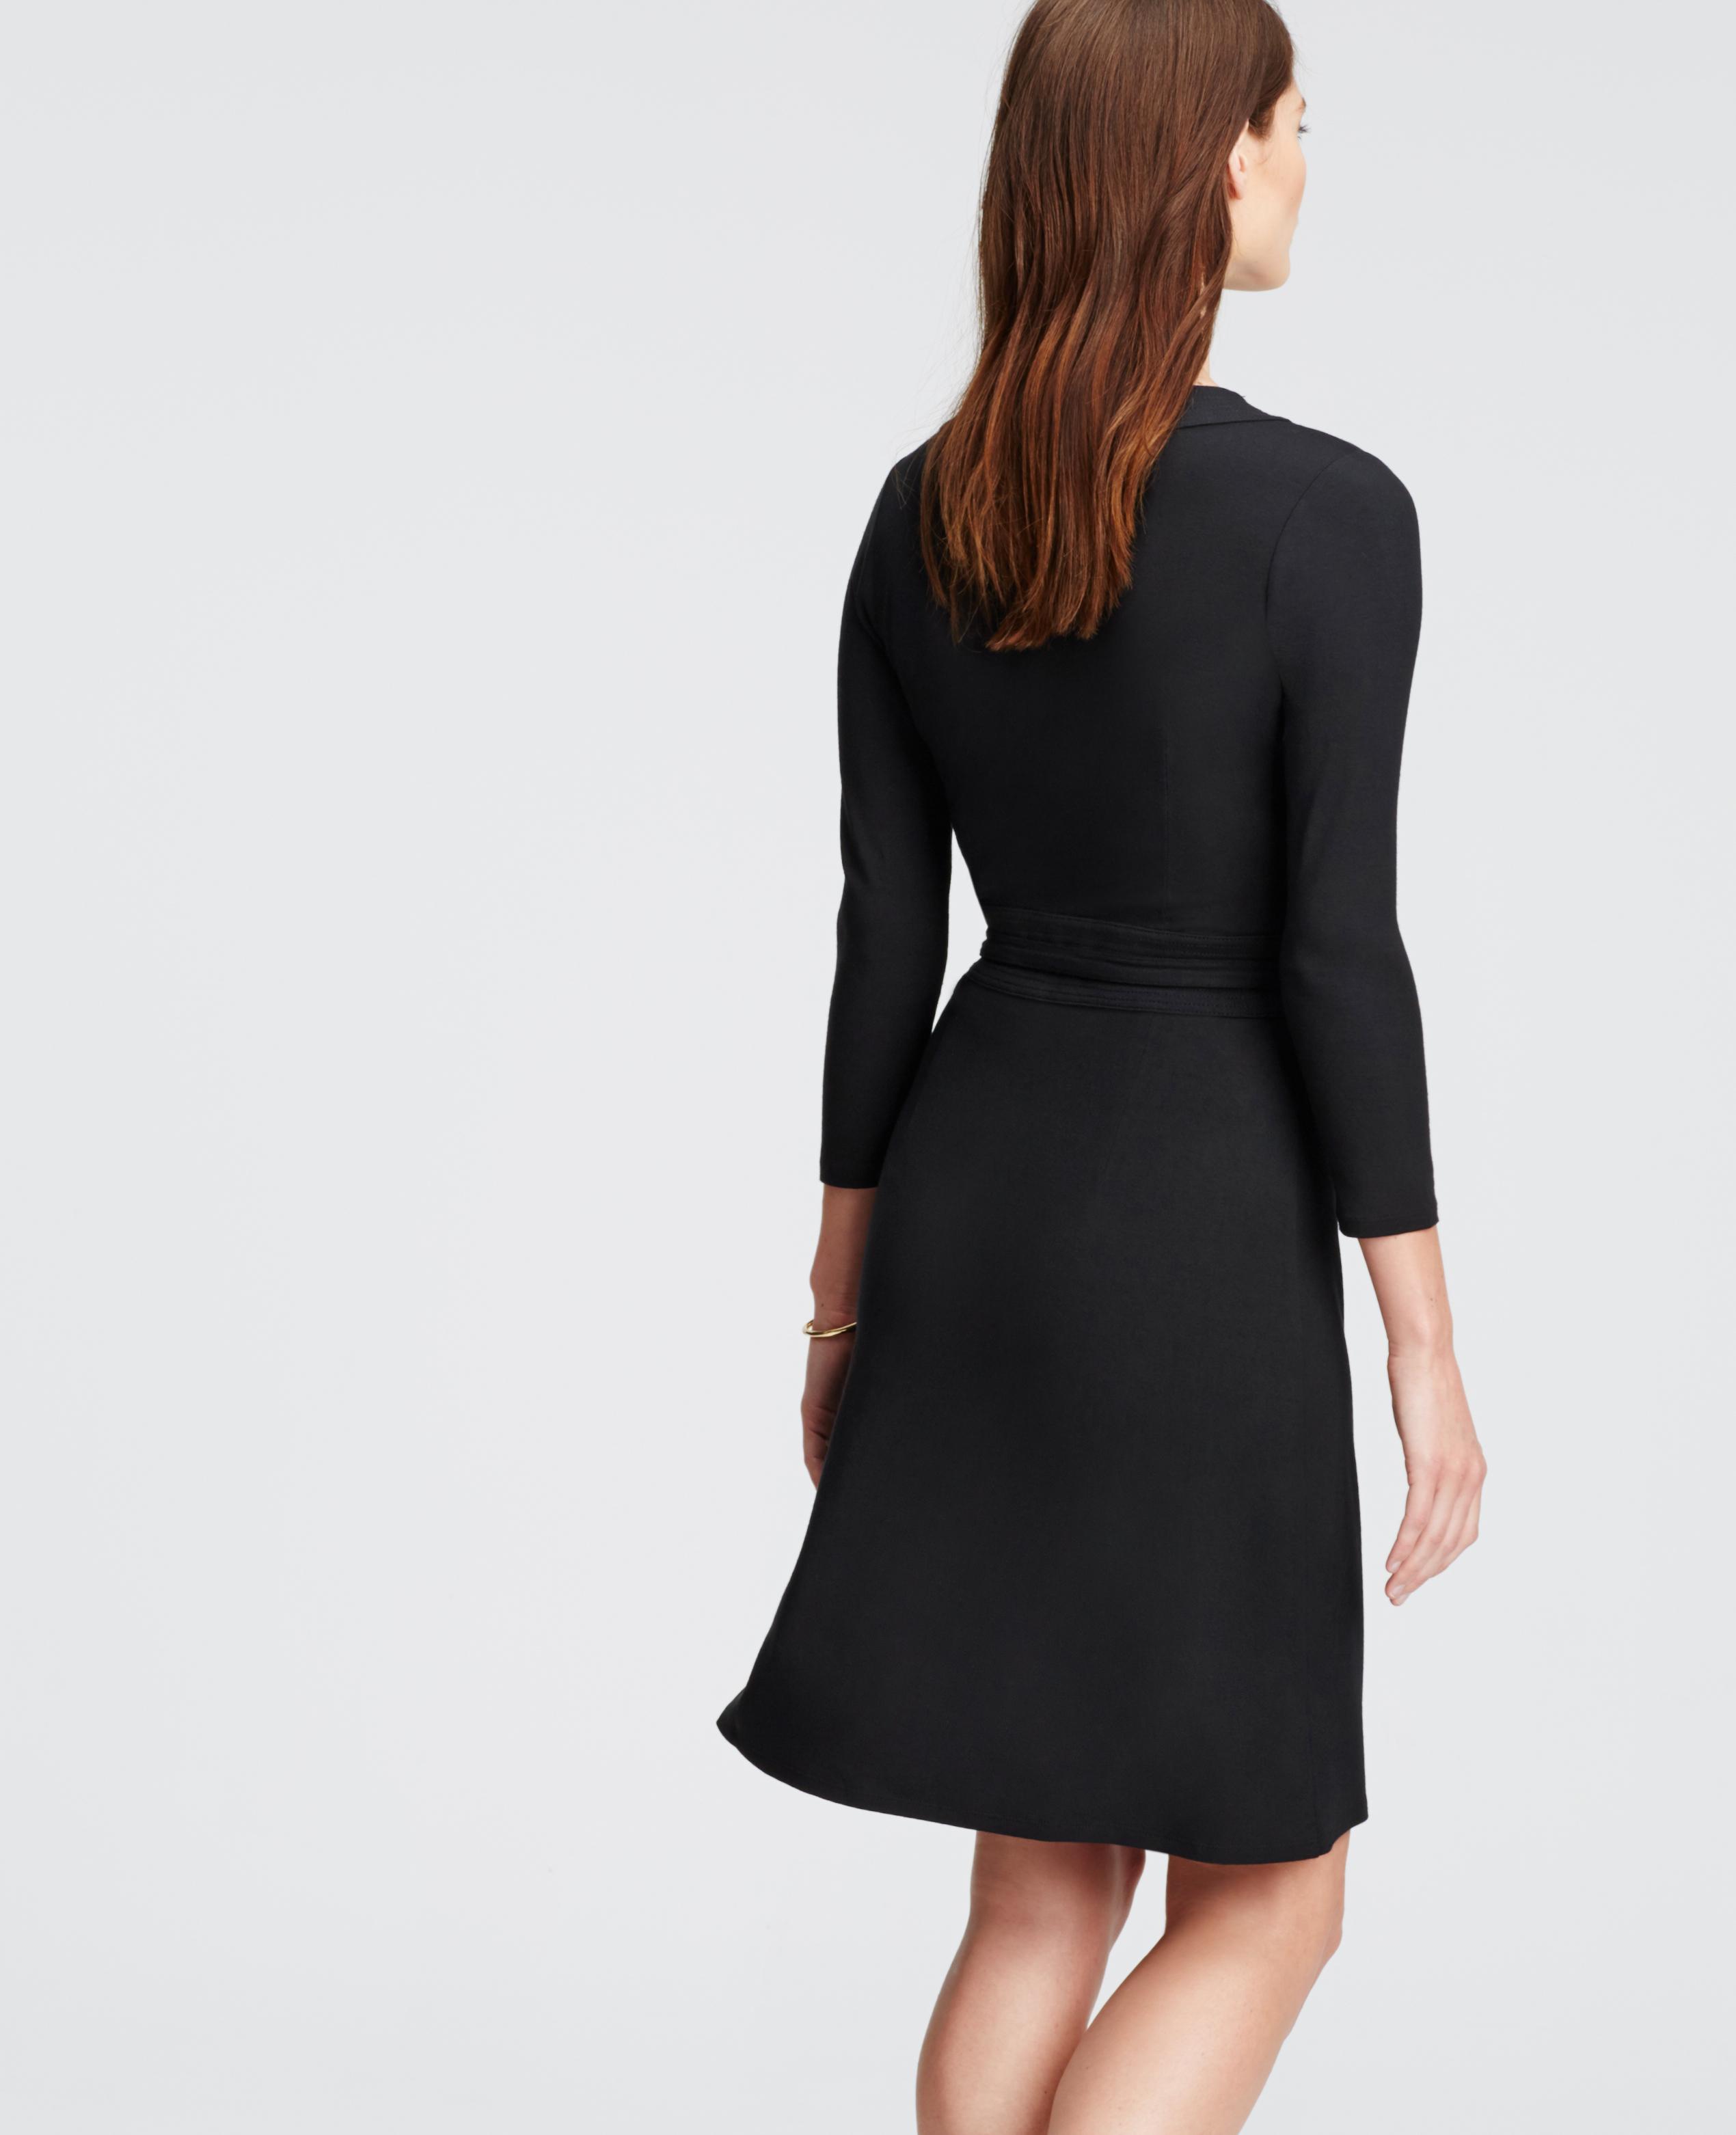 Ann Taylor Petite 3 4 Sleeve Wrap Dress In Black Lyst